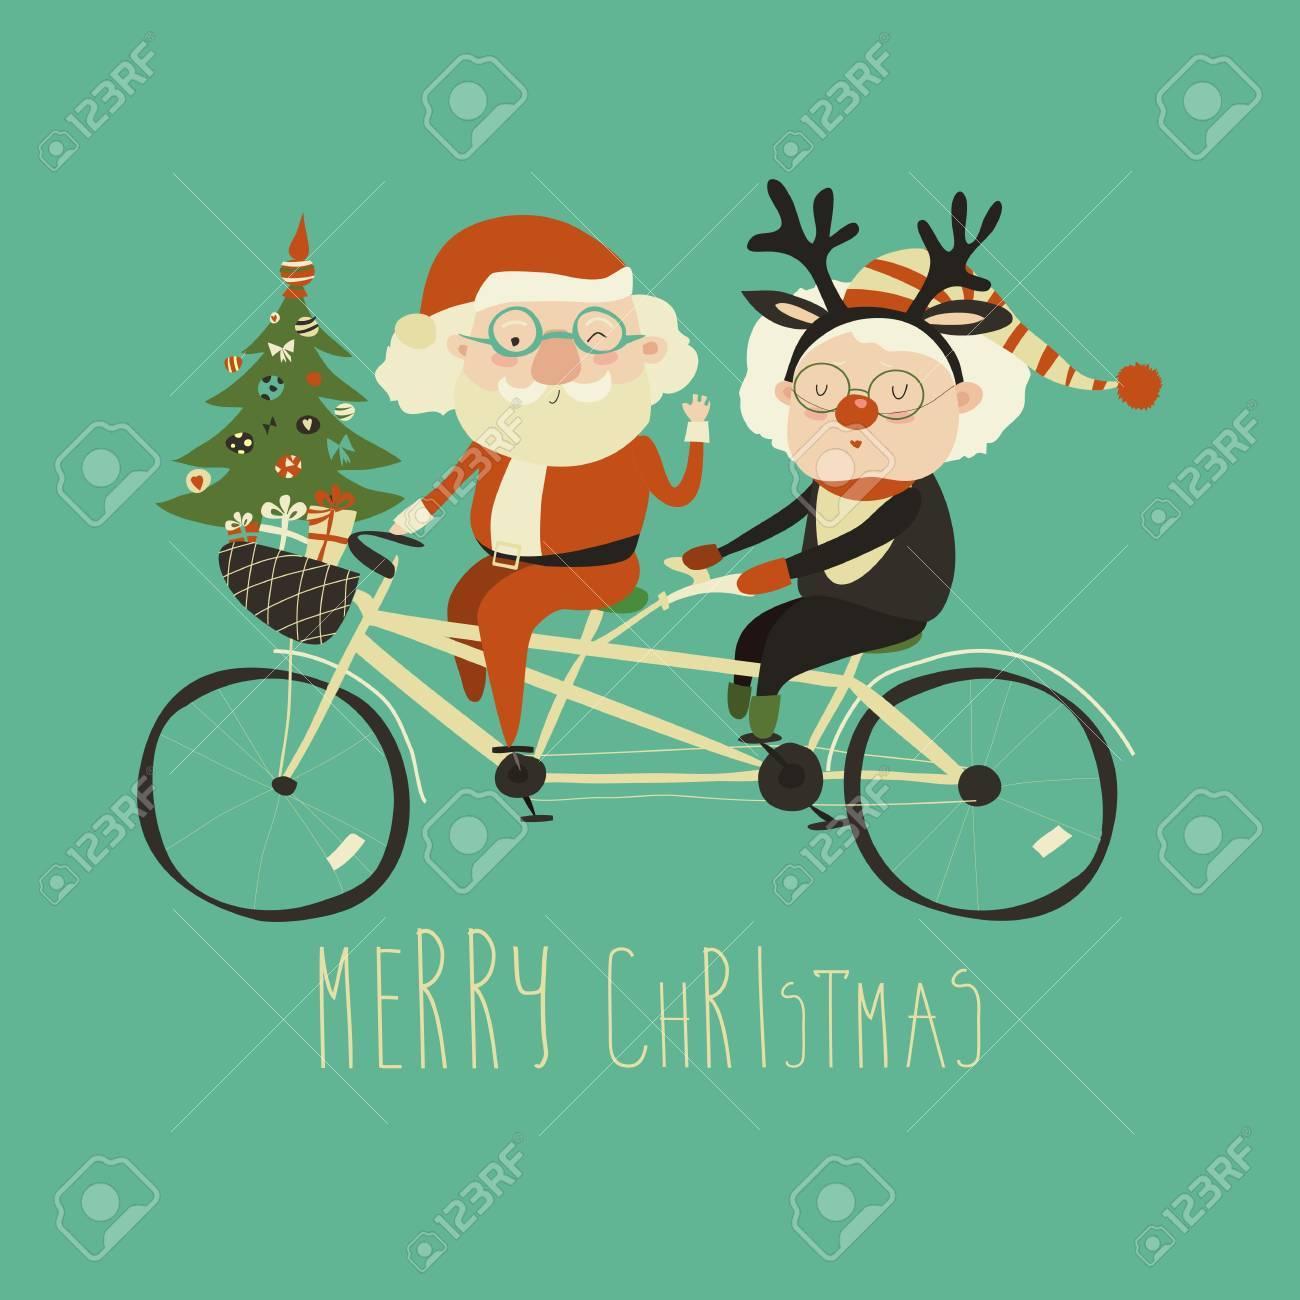 Cool Grandma With Grandpa As Santa Claus And Reindeer Riding